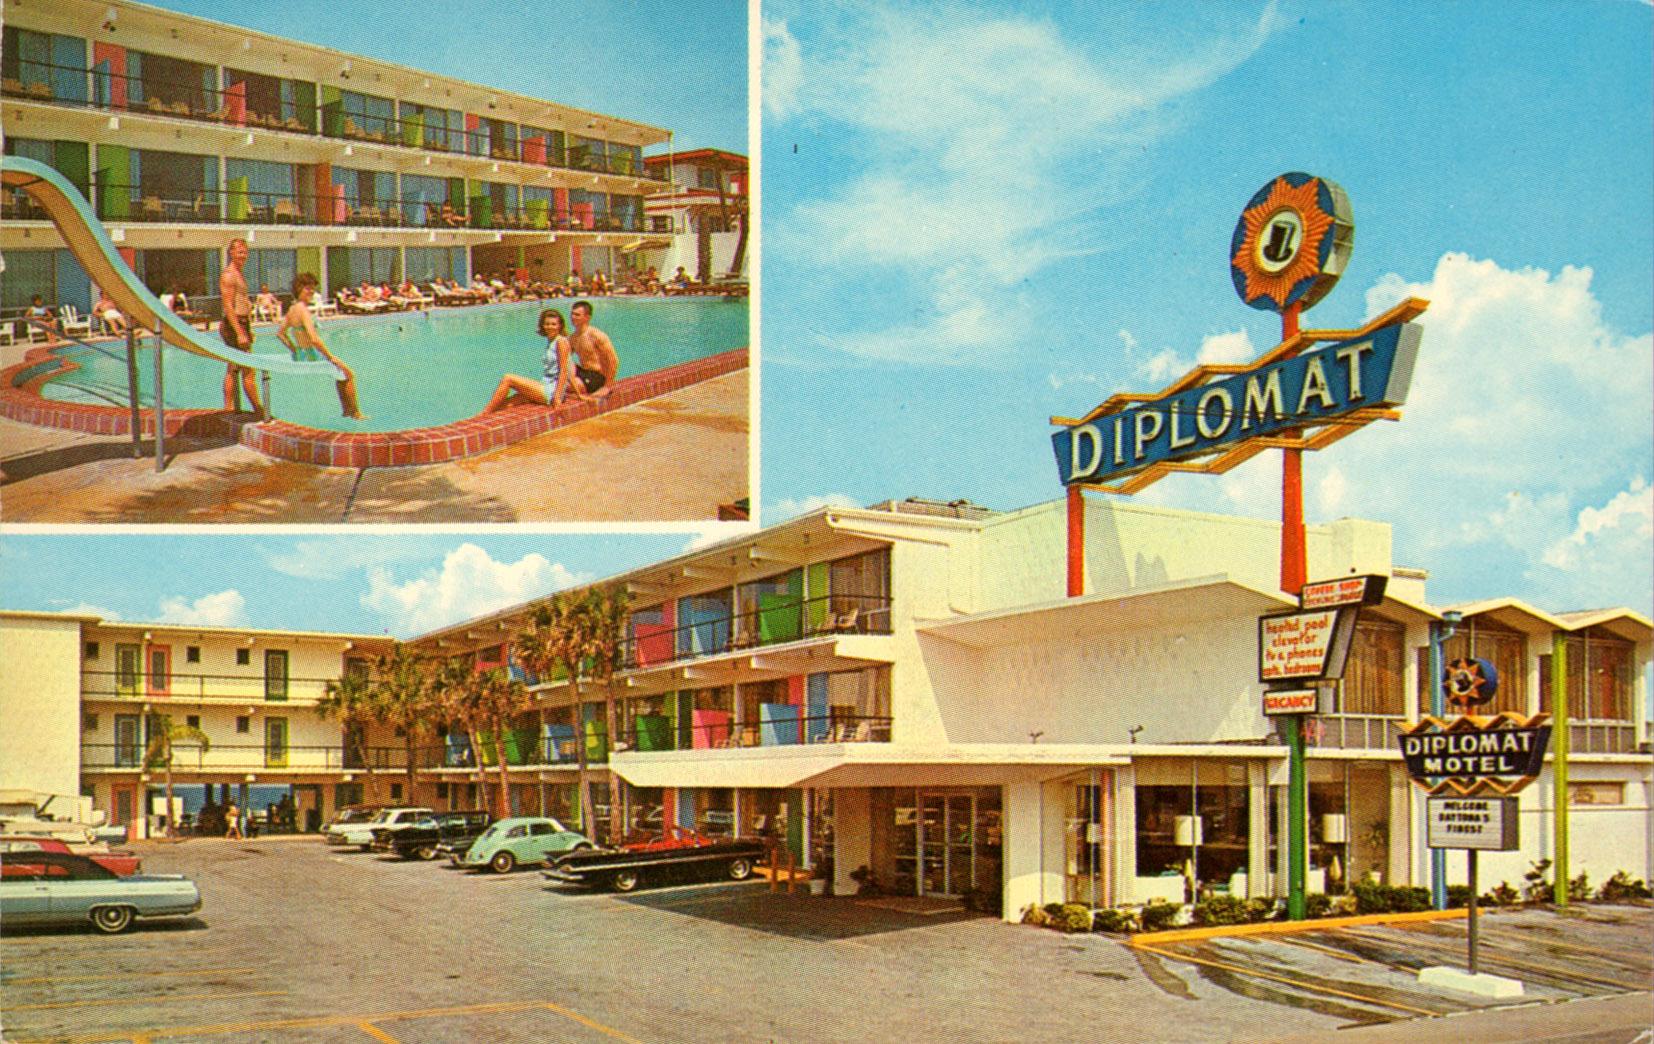 Diplomat Motel - Daytona Beach, Florida U.S.A. - 1960's